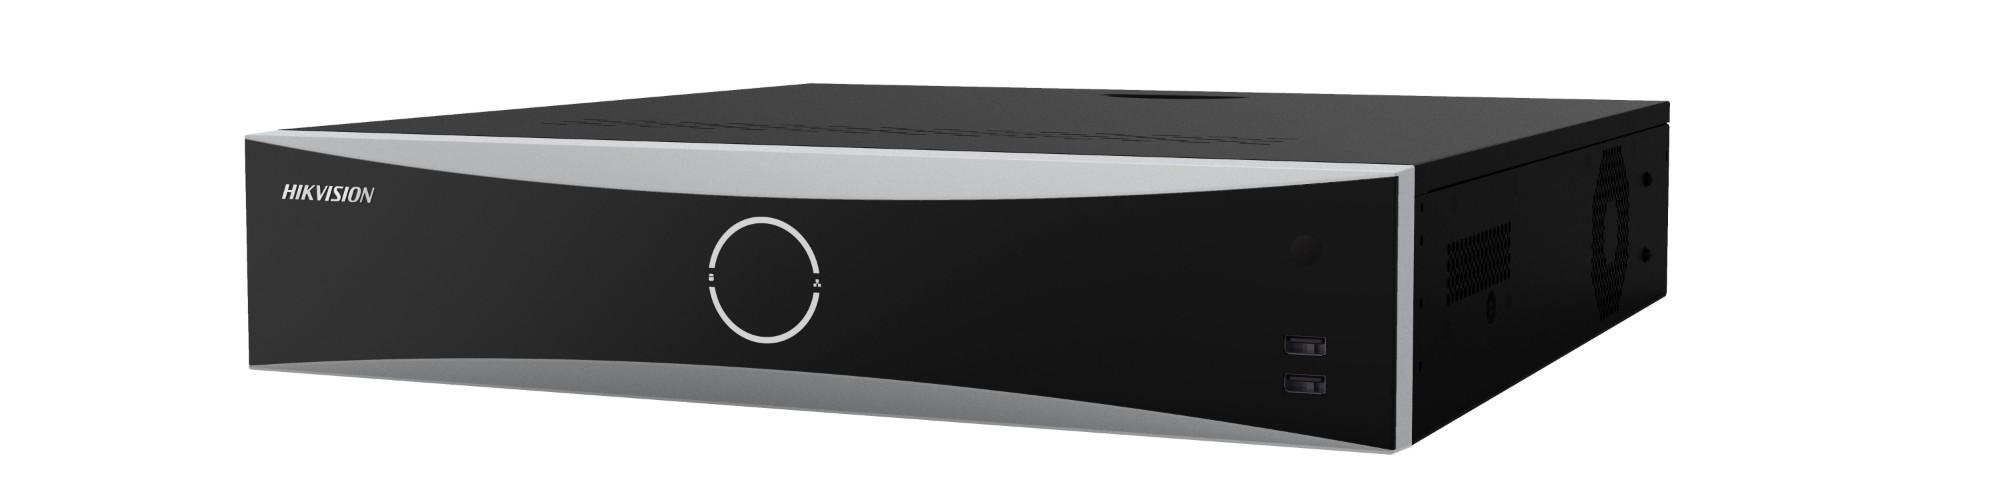 Hikvision Digital Technology DS-7732NI-I4/24P network video recorder Black,Grey